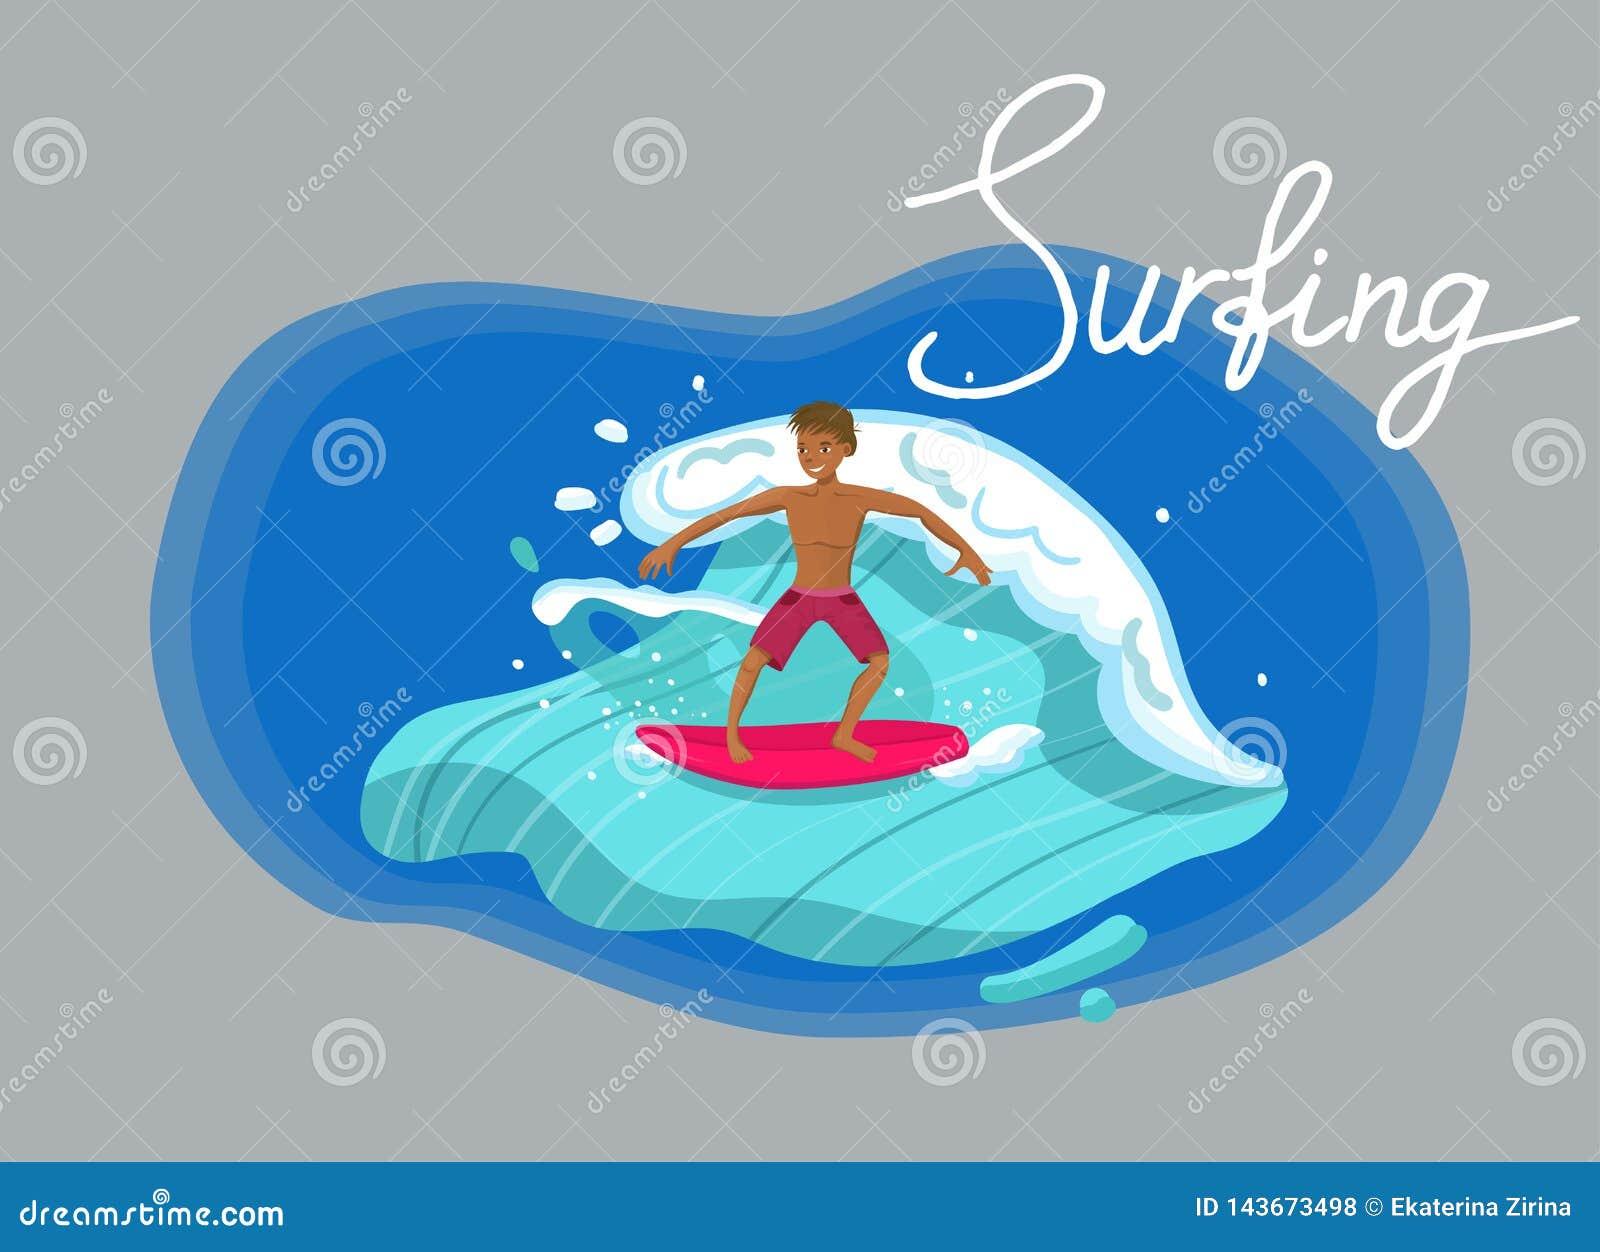 Ilustraci?n que practica surf